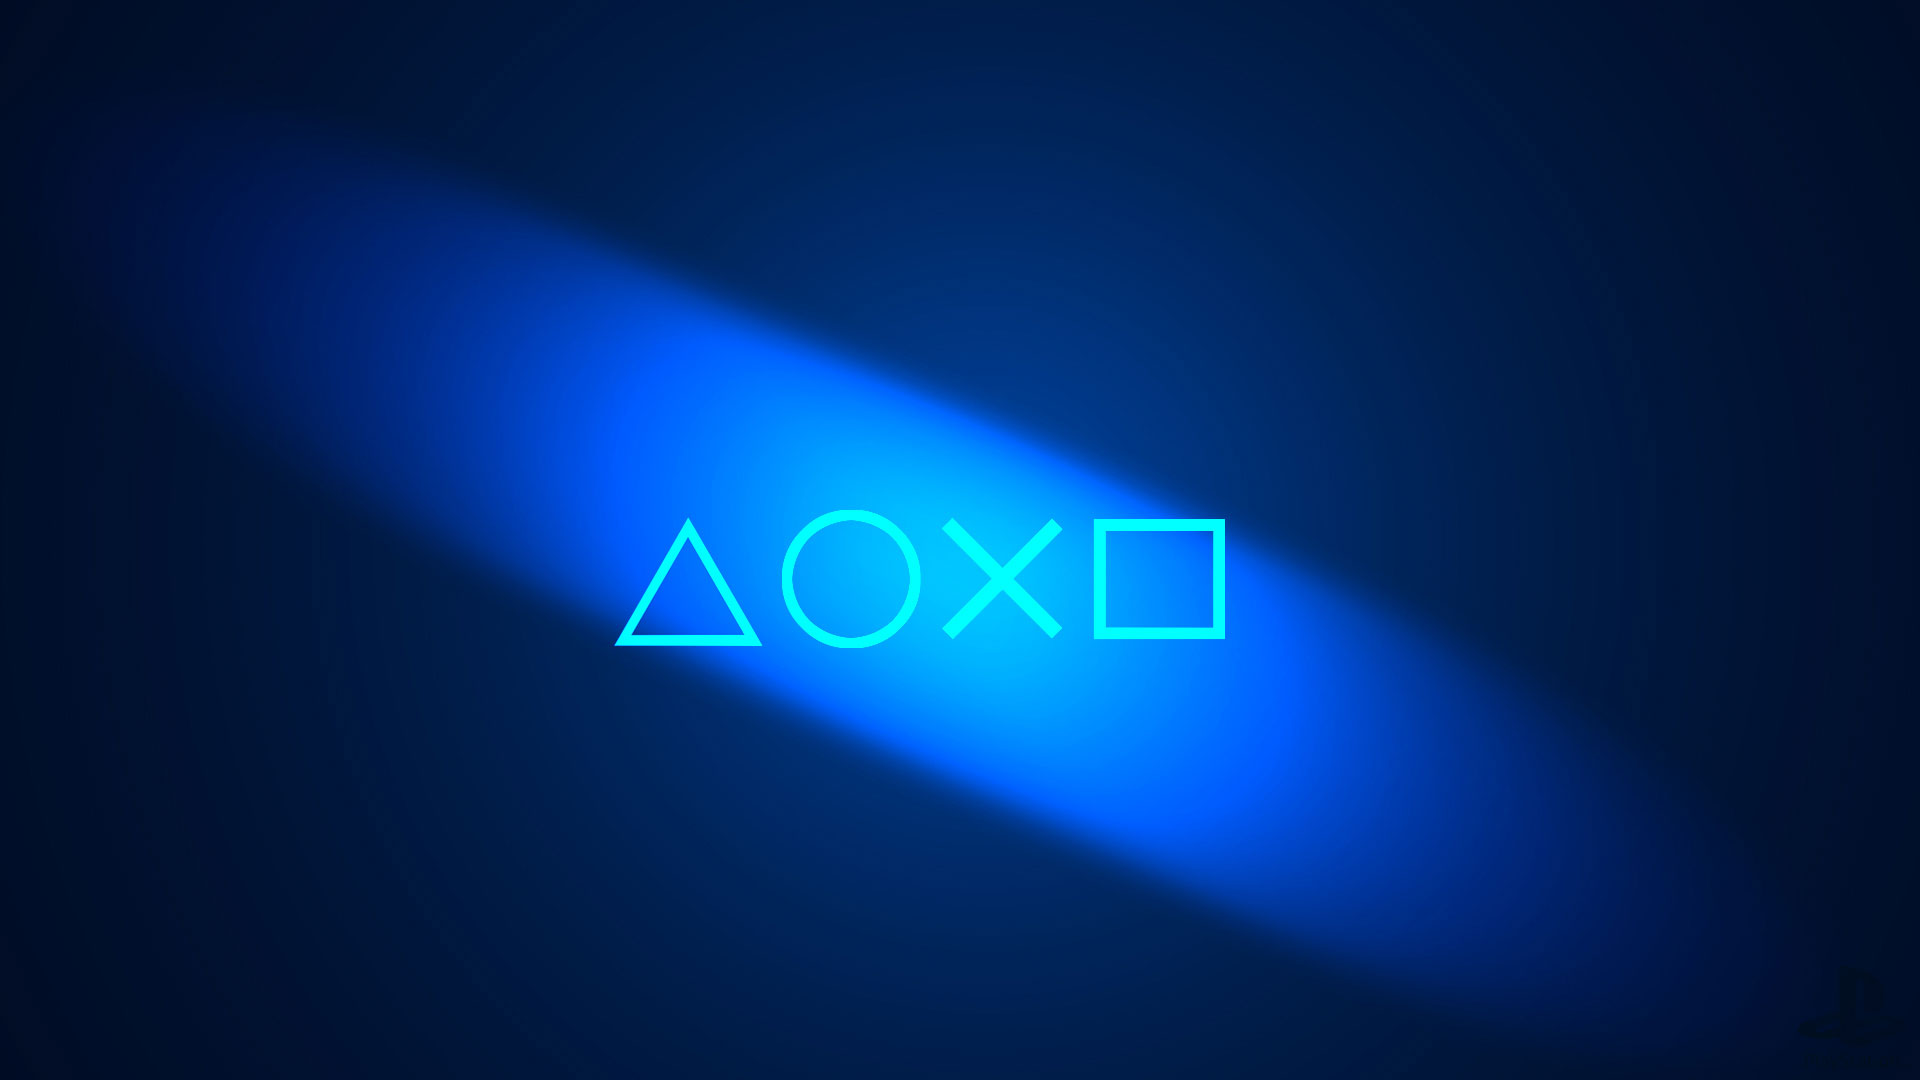 Nowe gry na PS4 i PS5